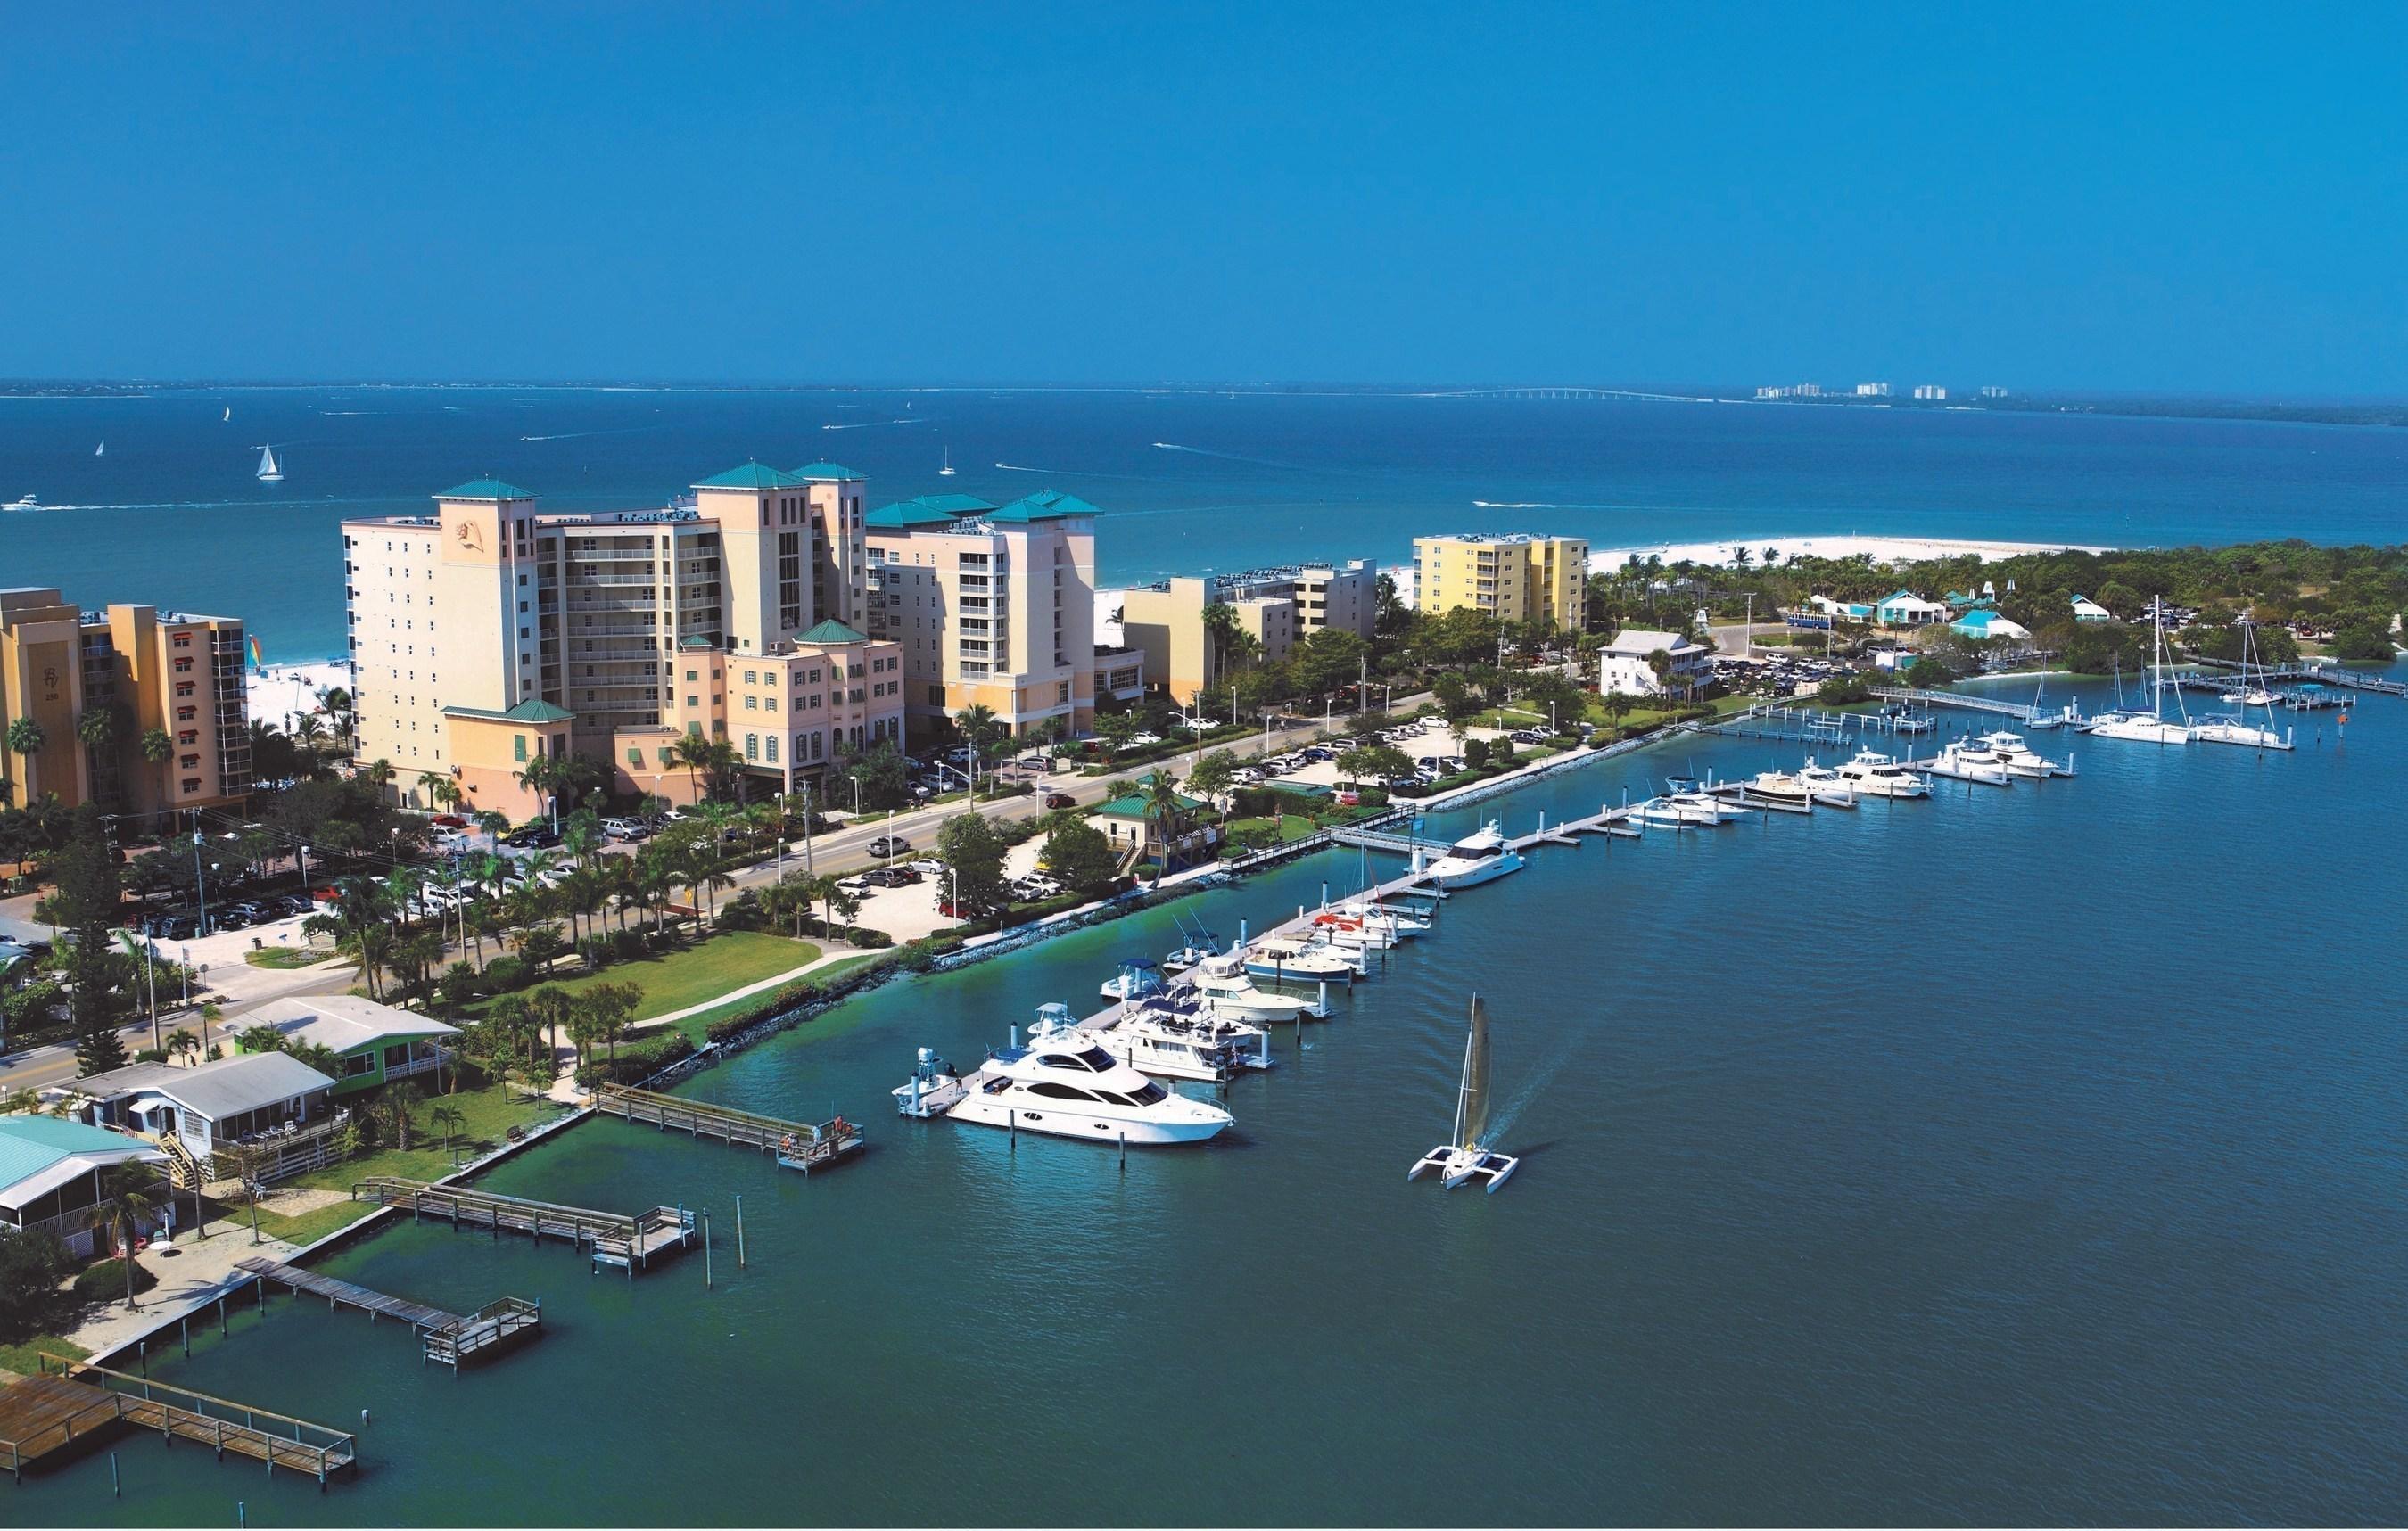 Pink Shell Beach Resort & Marina Named Top 5 U